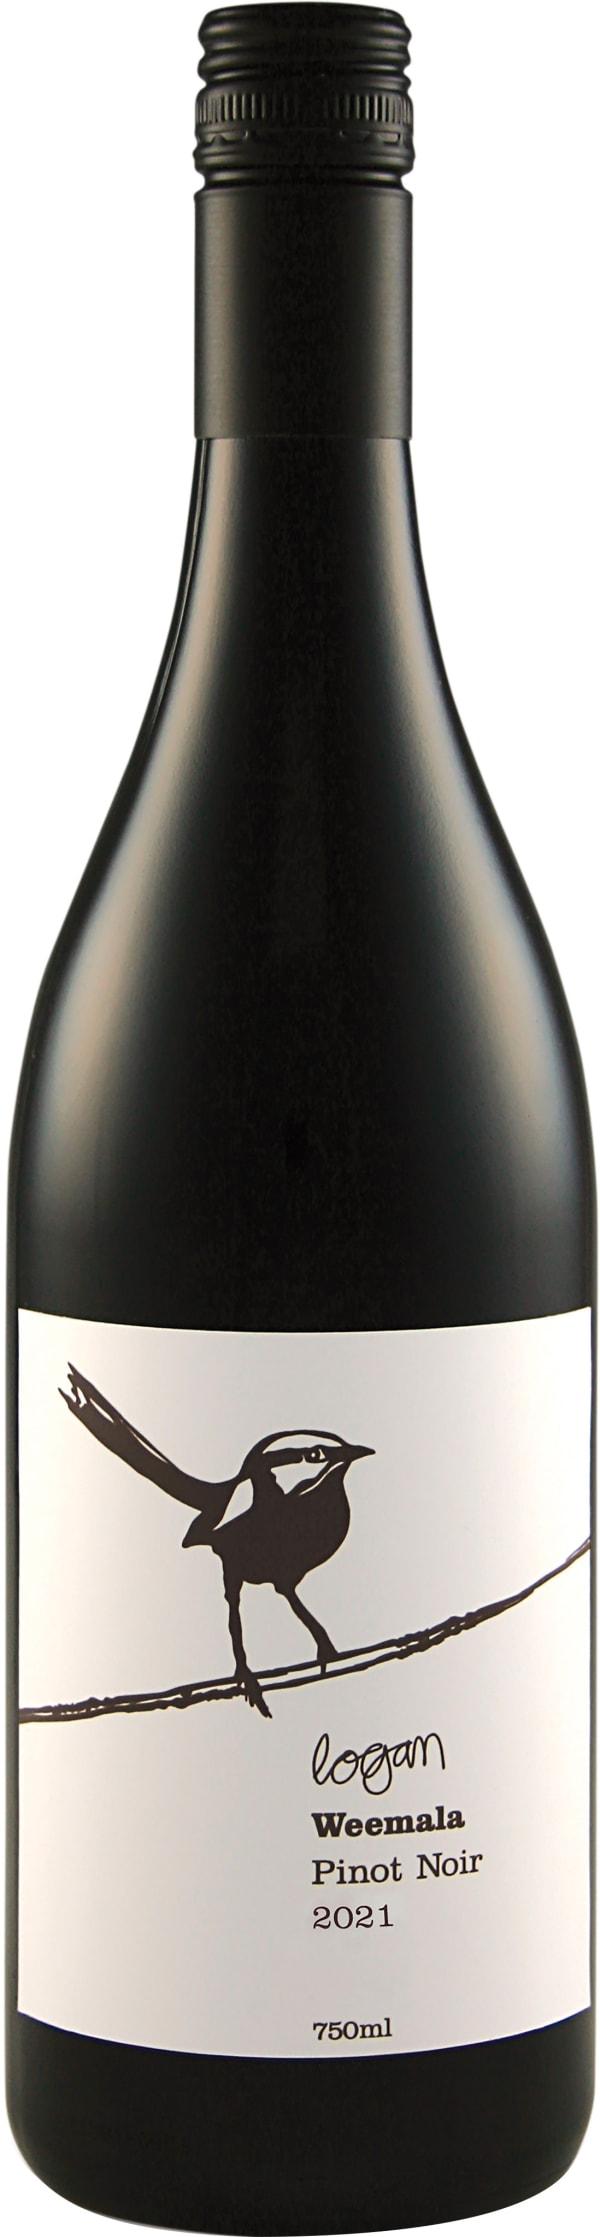 Logan Weemala Pinot Noir 2016